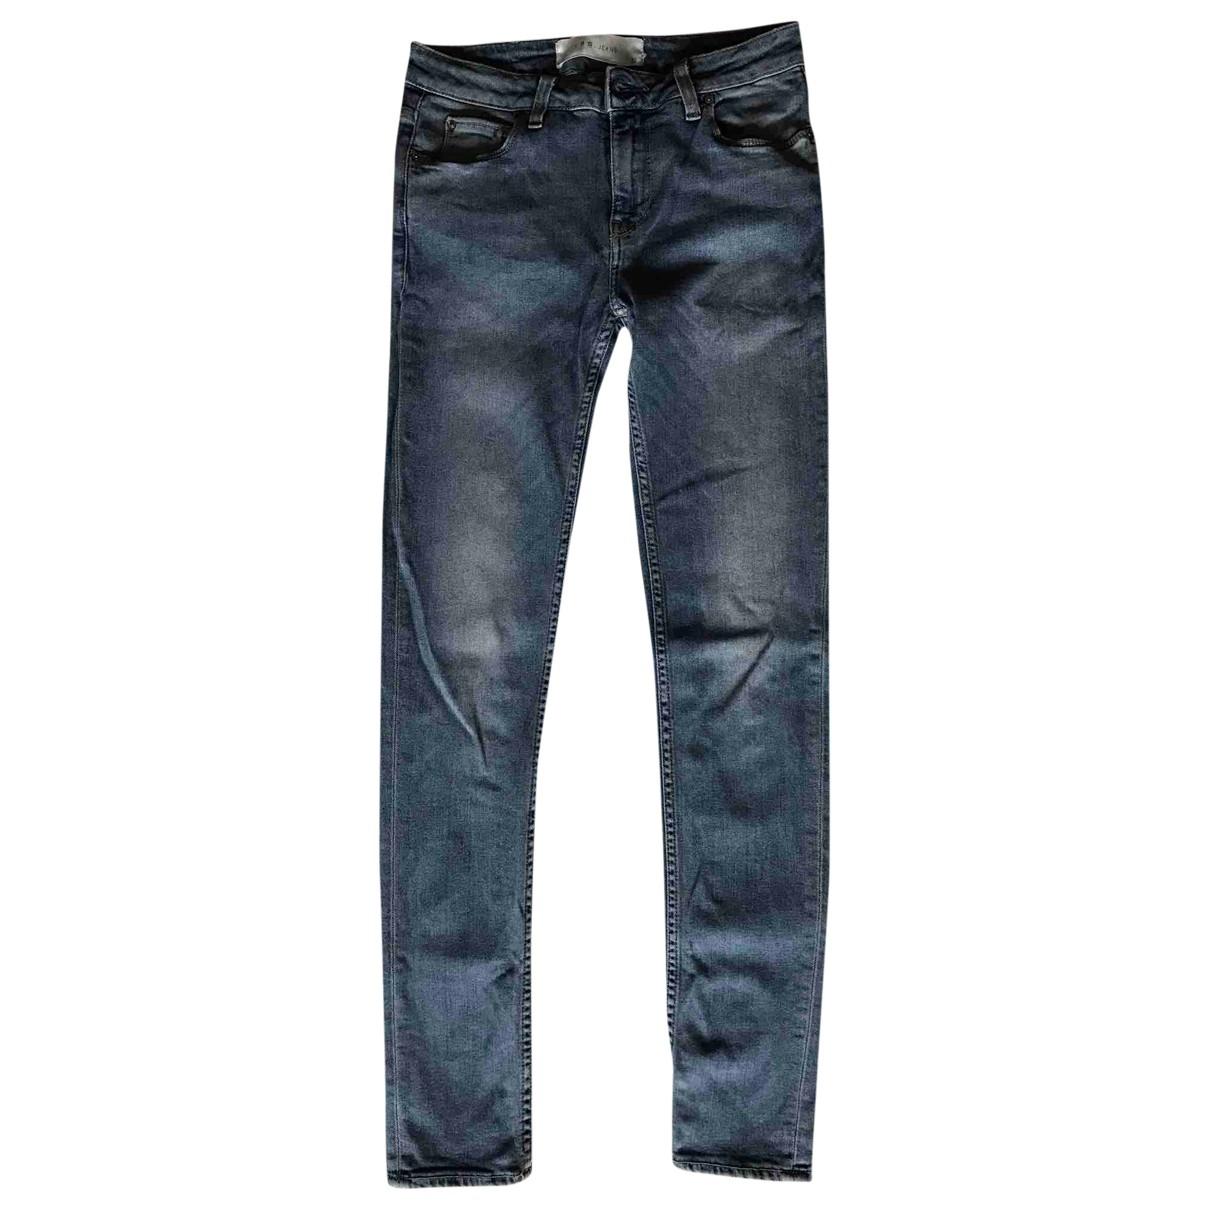 Iro \N Blue Denim - Jeans Jeans for Women 27 US